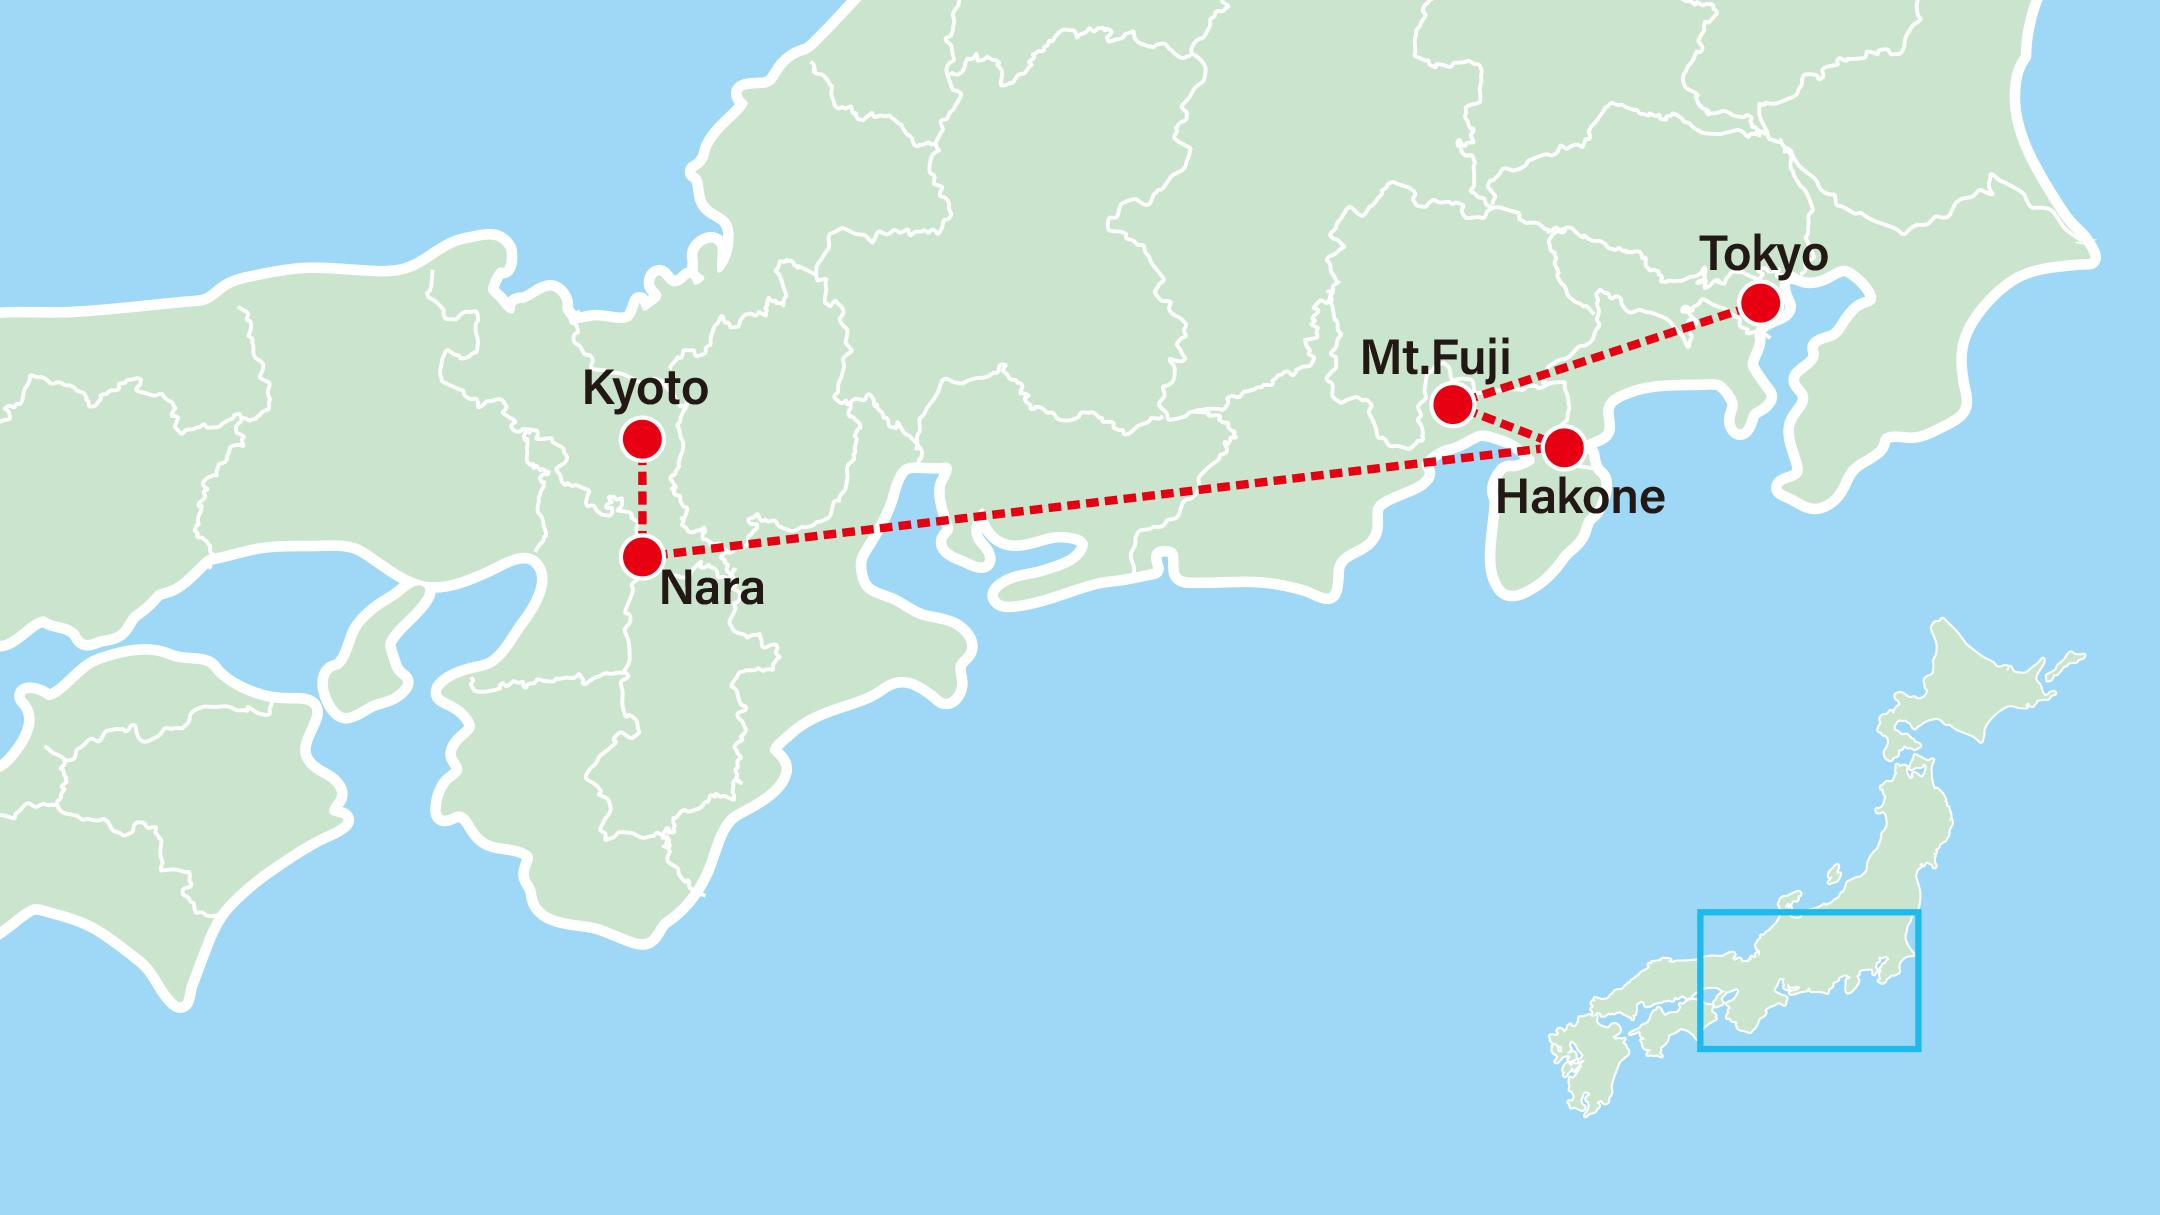 Golden Route of Japan 7 Days-Nara-Kyoto-Hakone-Tokyo